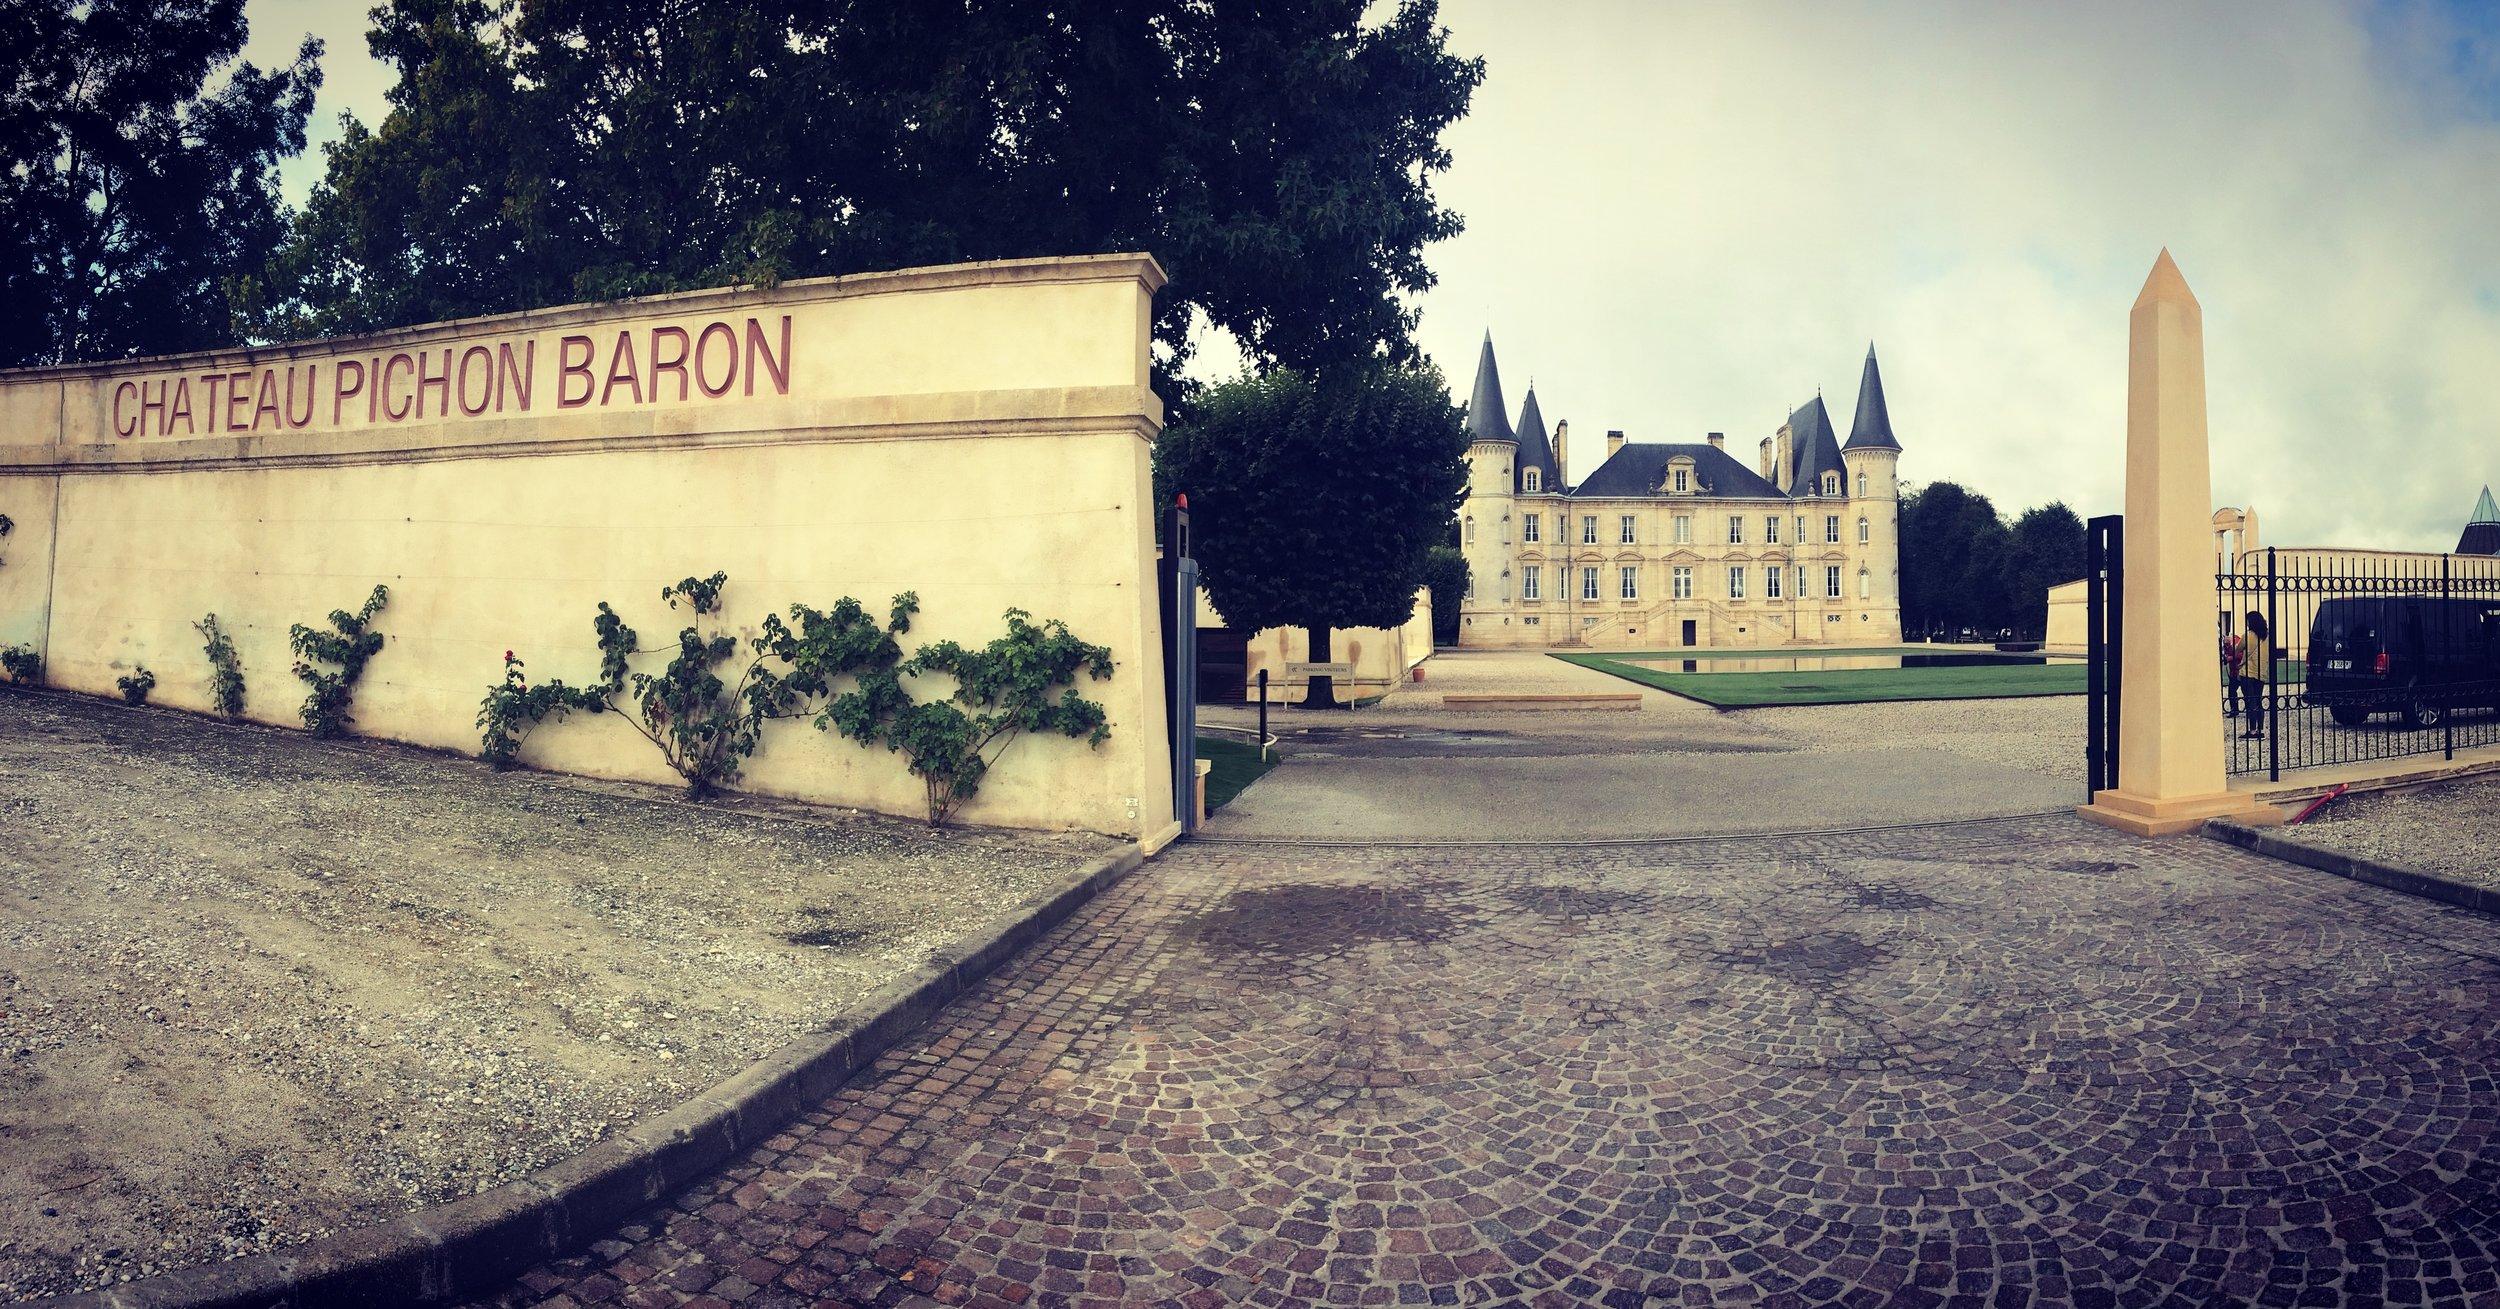 Chateau Pichon Baron in Pauillac, Medoc